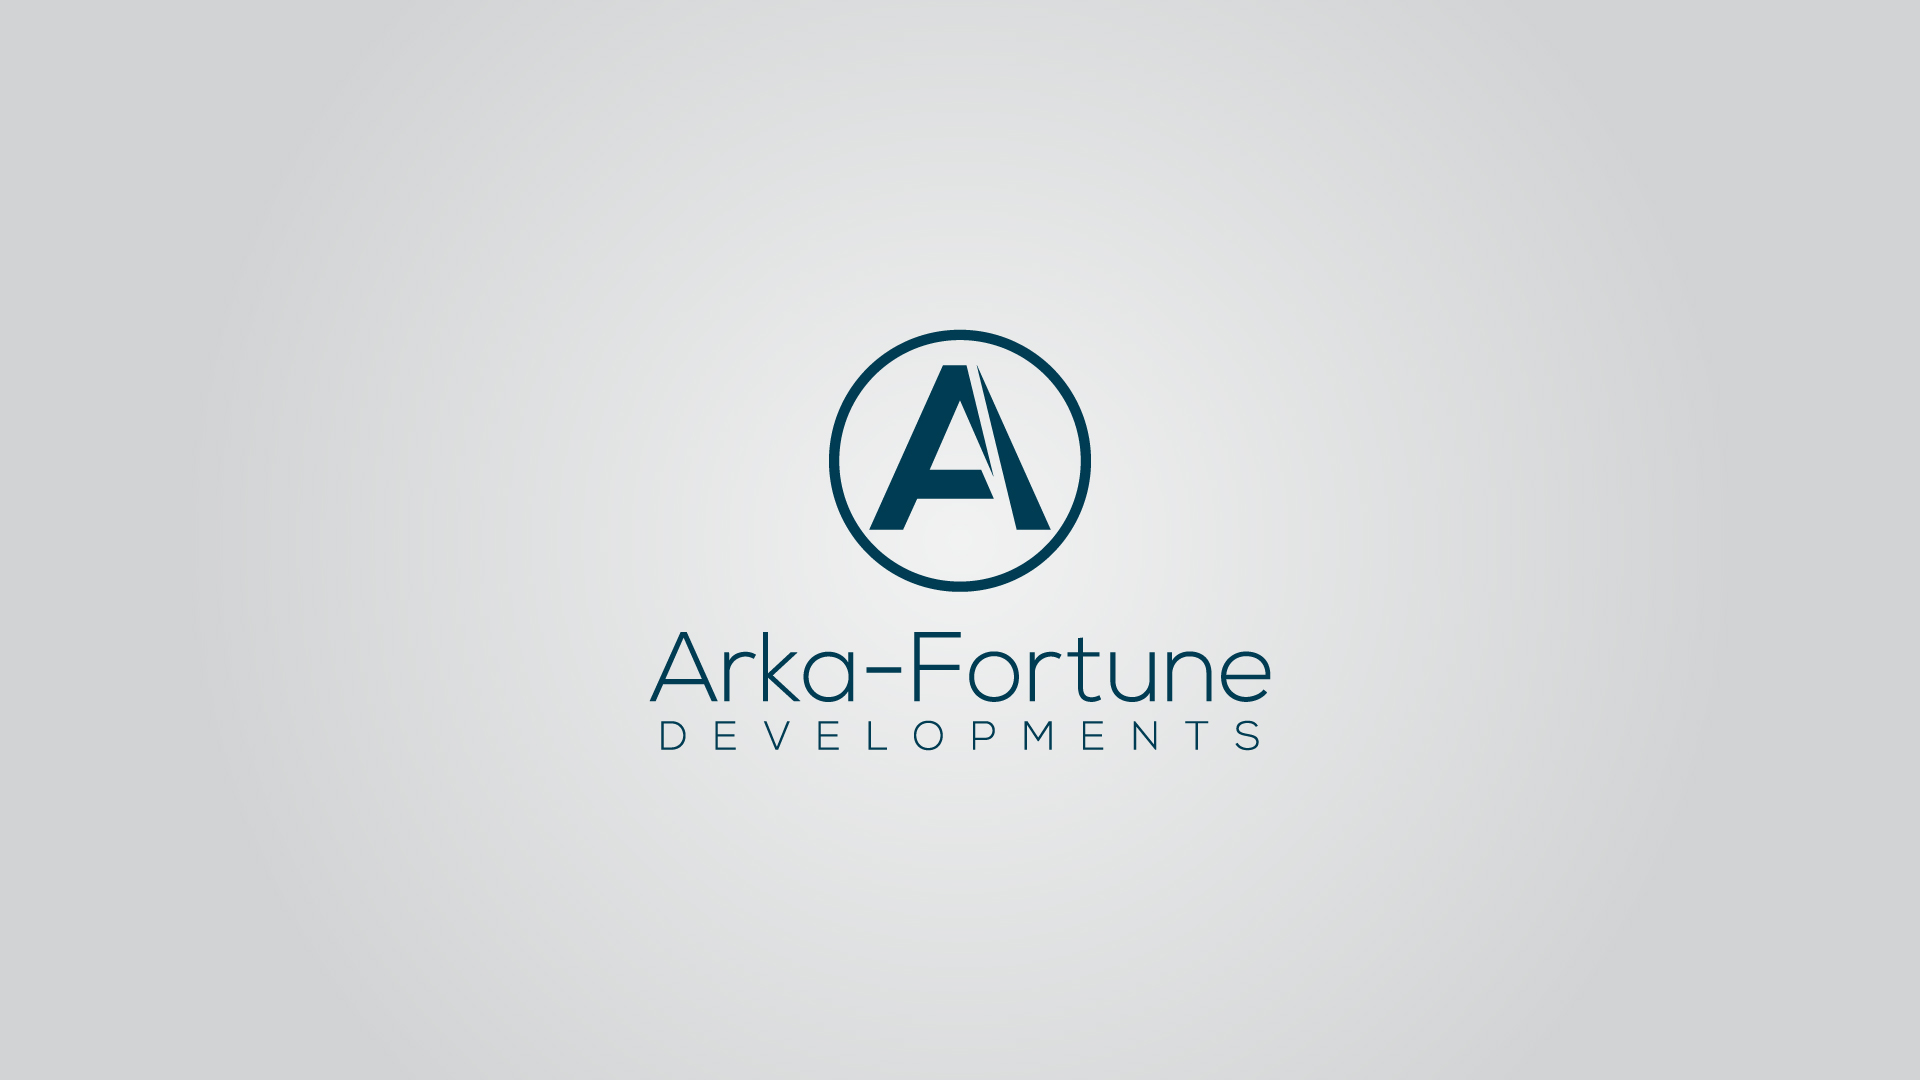 Logo Design by MD SHOHIDUL ISLAM - Entry No. 68 in the Logo Design Contest Arka-Fortune Developments Logo Design.